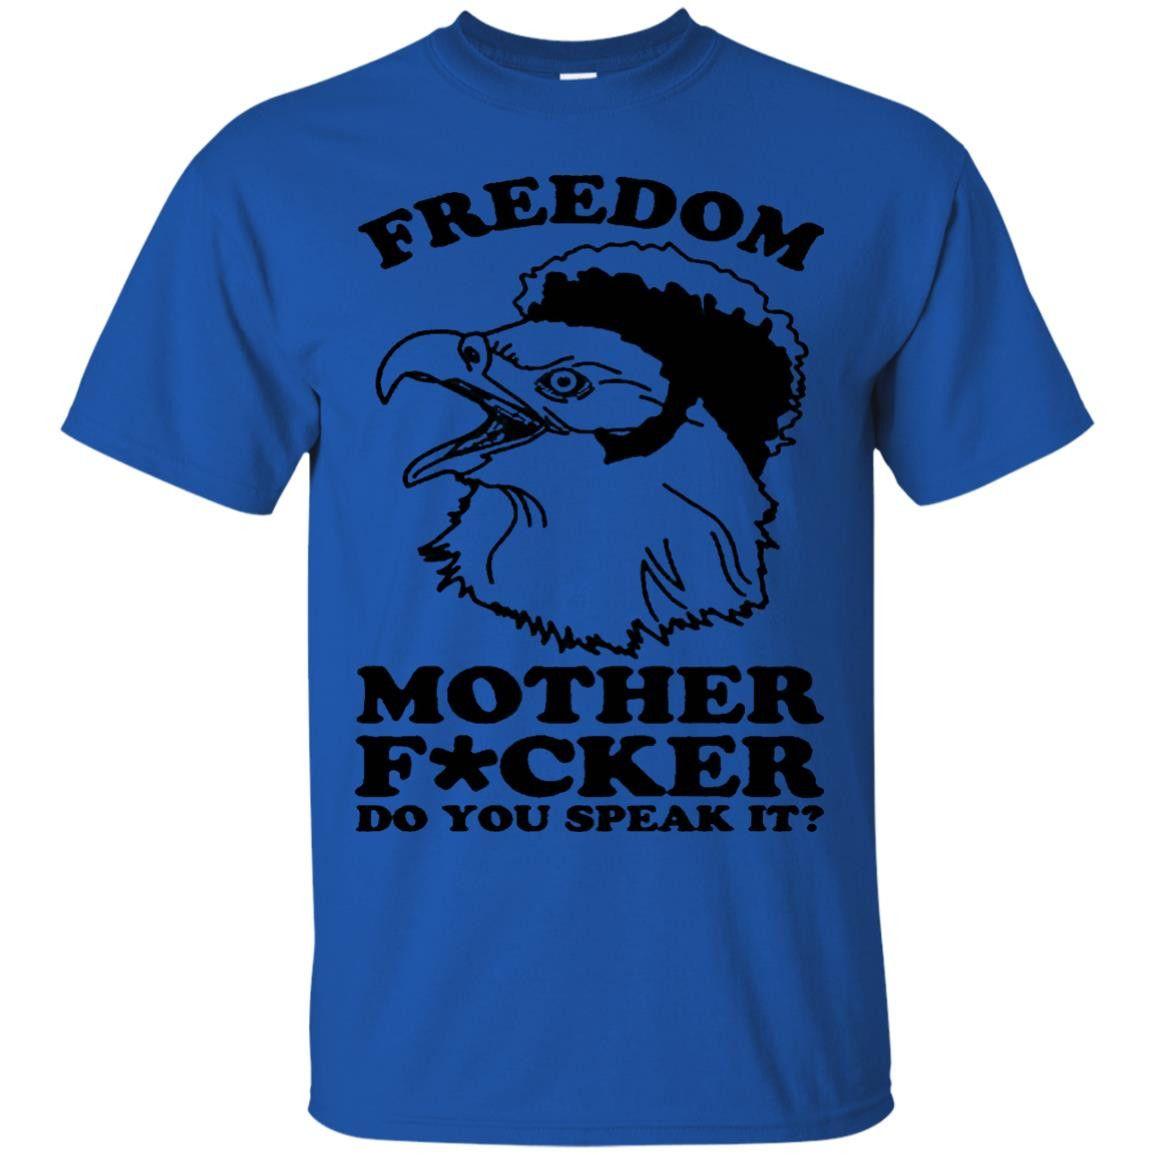 97d5d9c21c0c9 America Shirts SAMUEL EAGLE JACKSON T-shirts Hoodies Sweatshirts ...